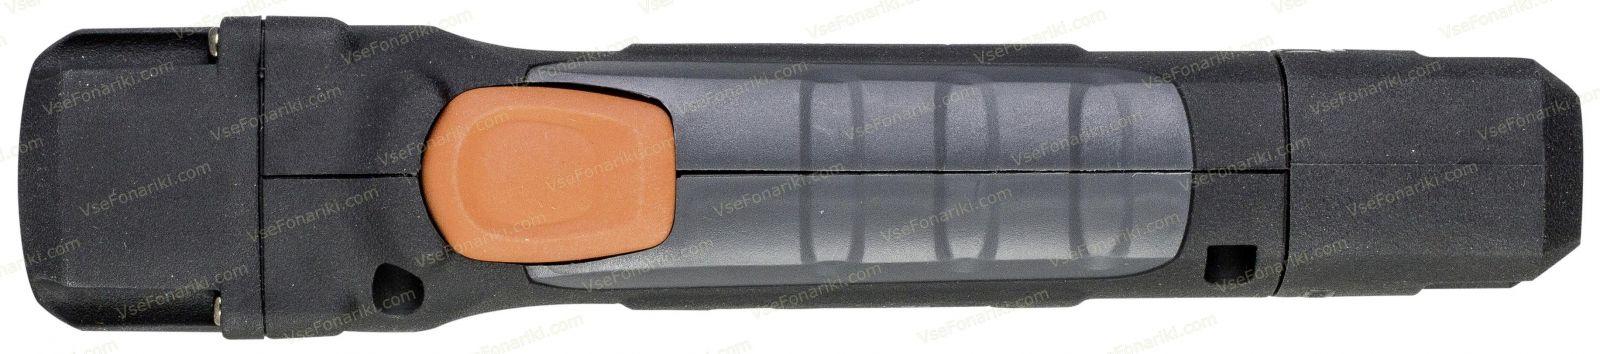 Фото 2 фонаря Energizer Hard Case Pro 2AA